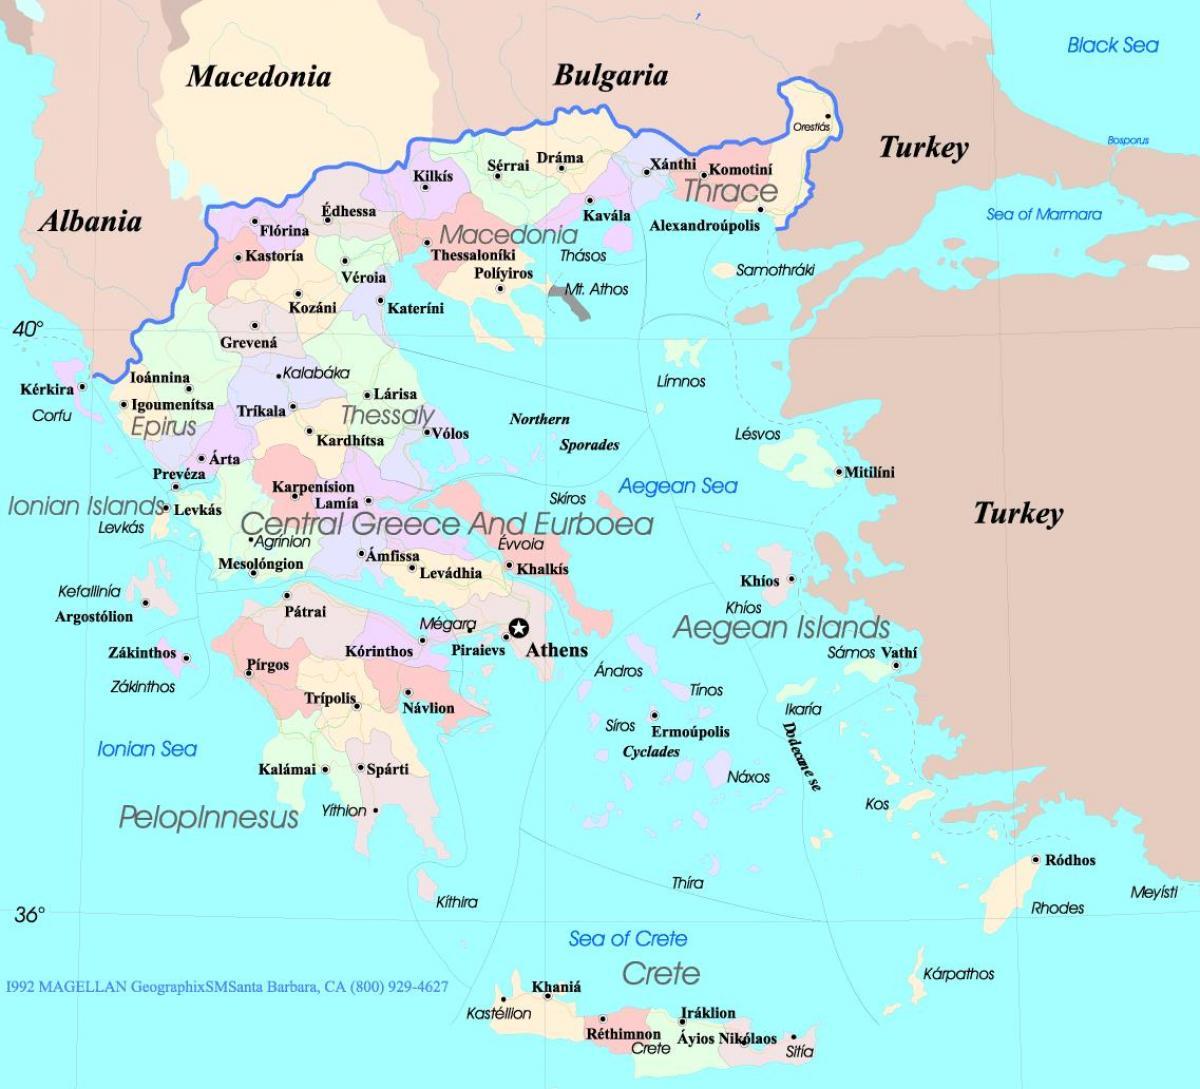 Mapa Recko A Ostrovy Recko Mapa Ostrovy Jizni Evropa Evropa